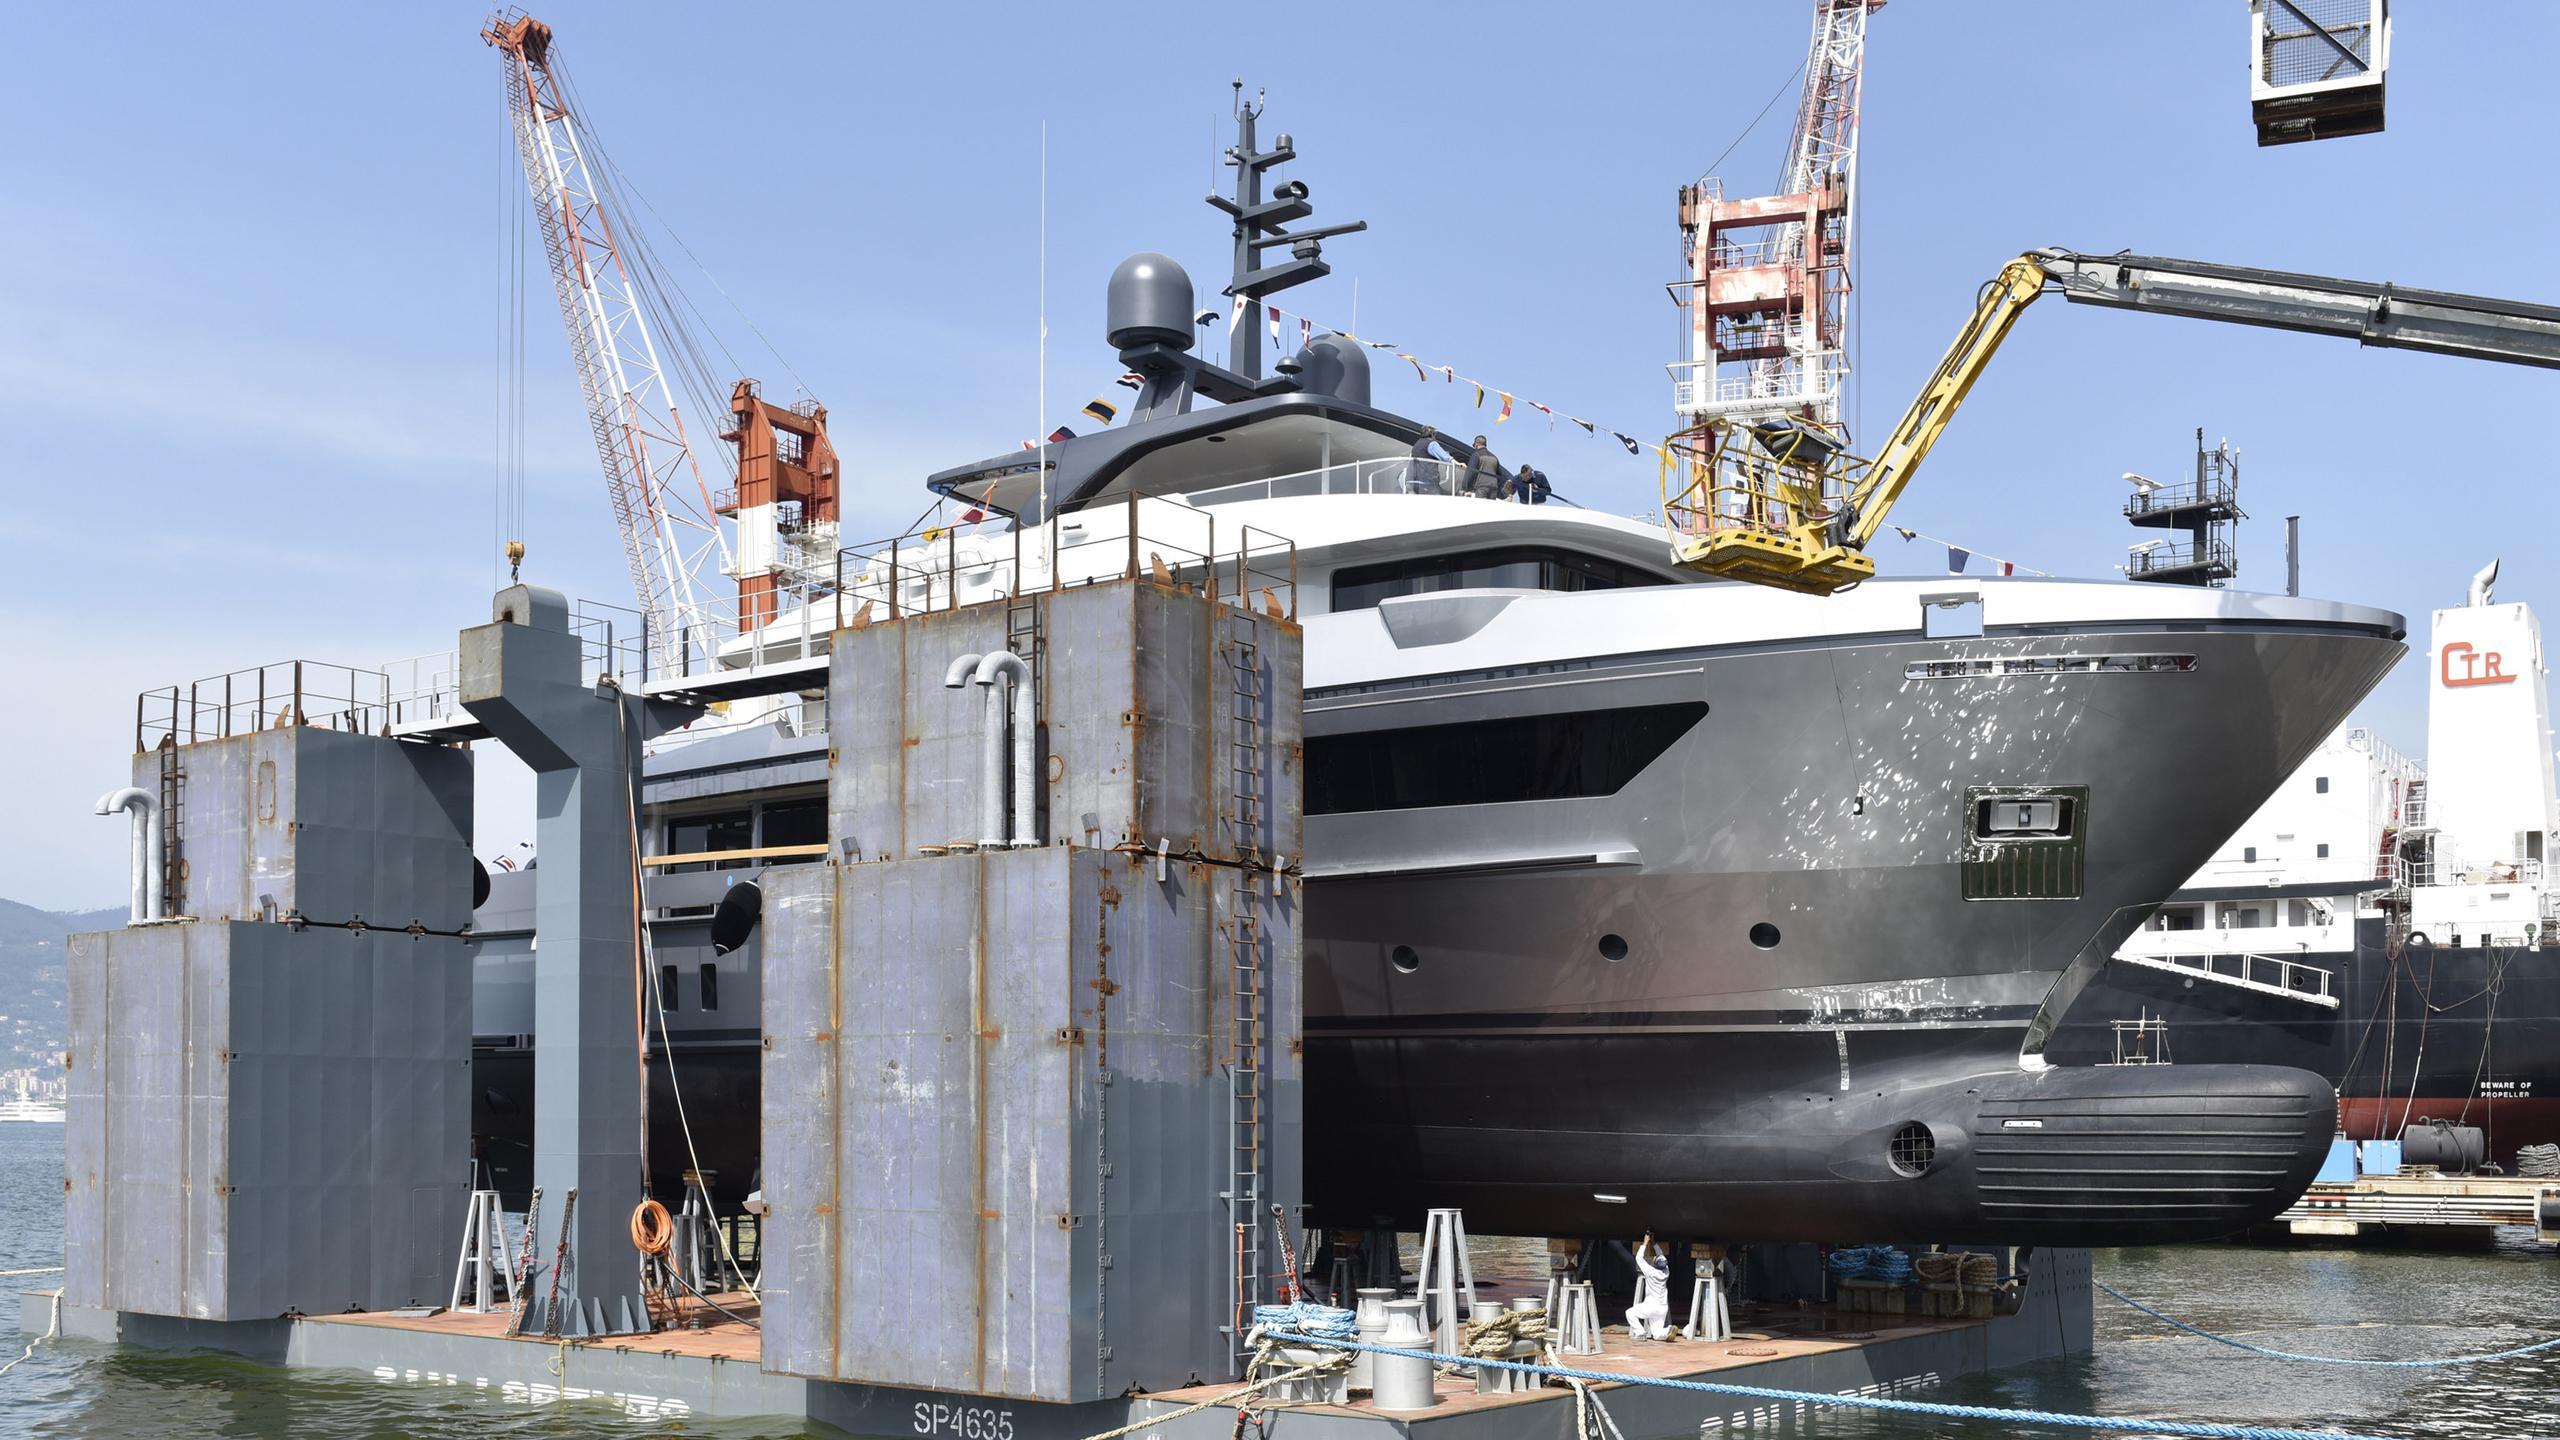 460exp 128 motoryacht sanlorenzo yachts 42m 2018 launch half profile